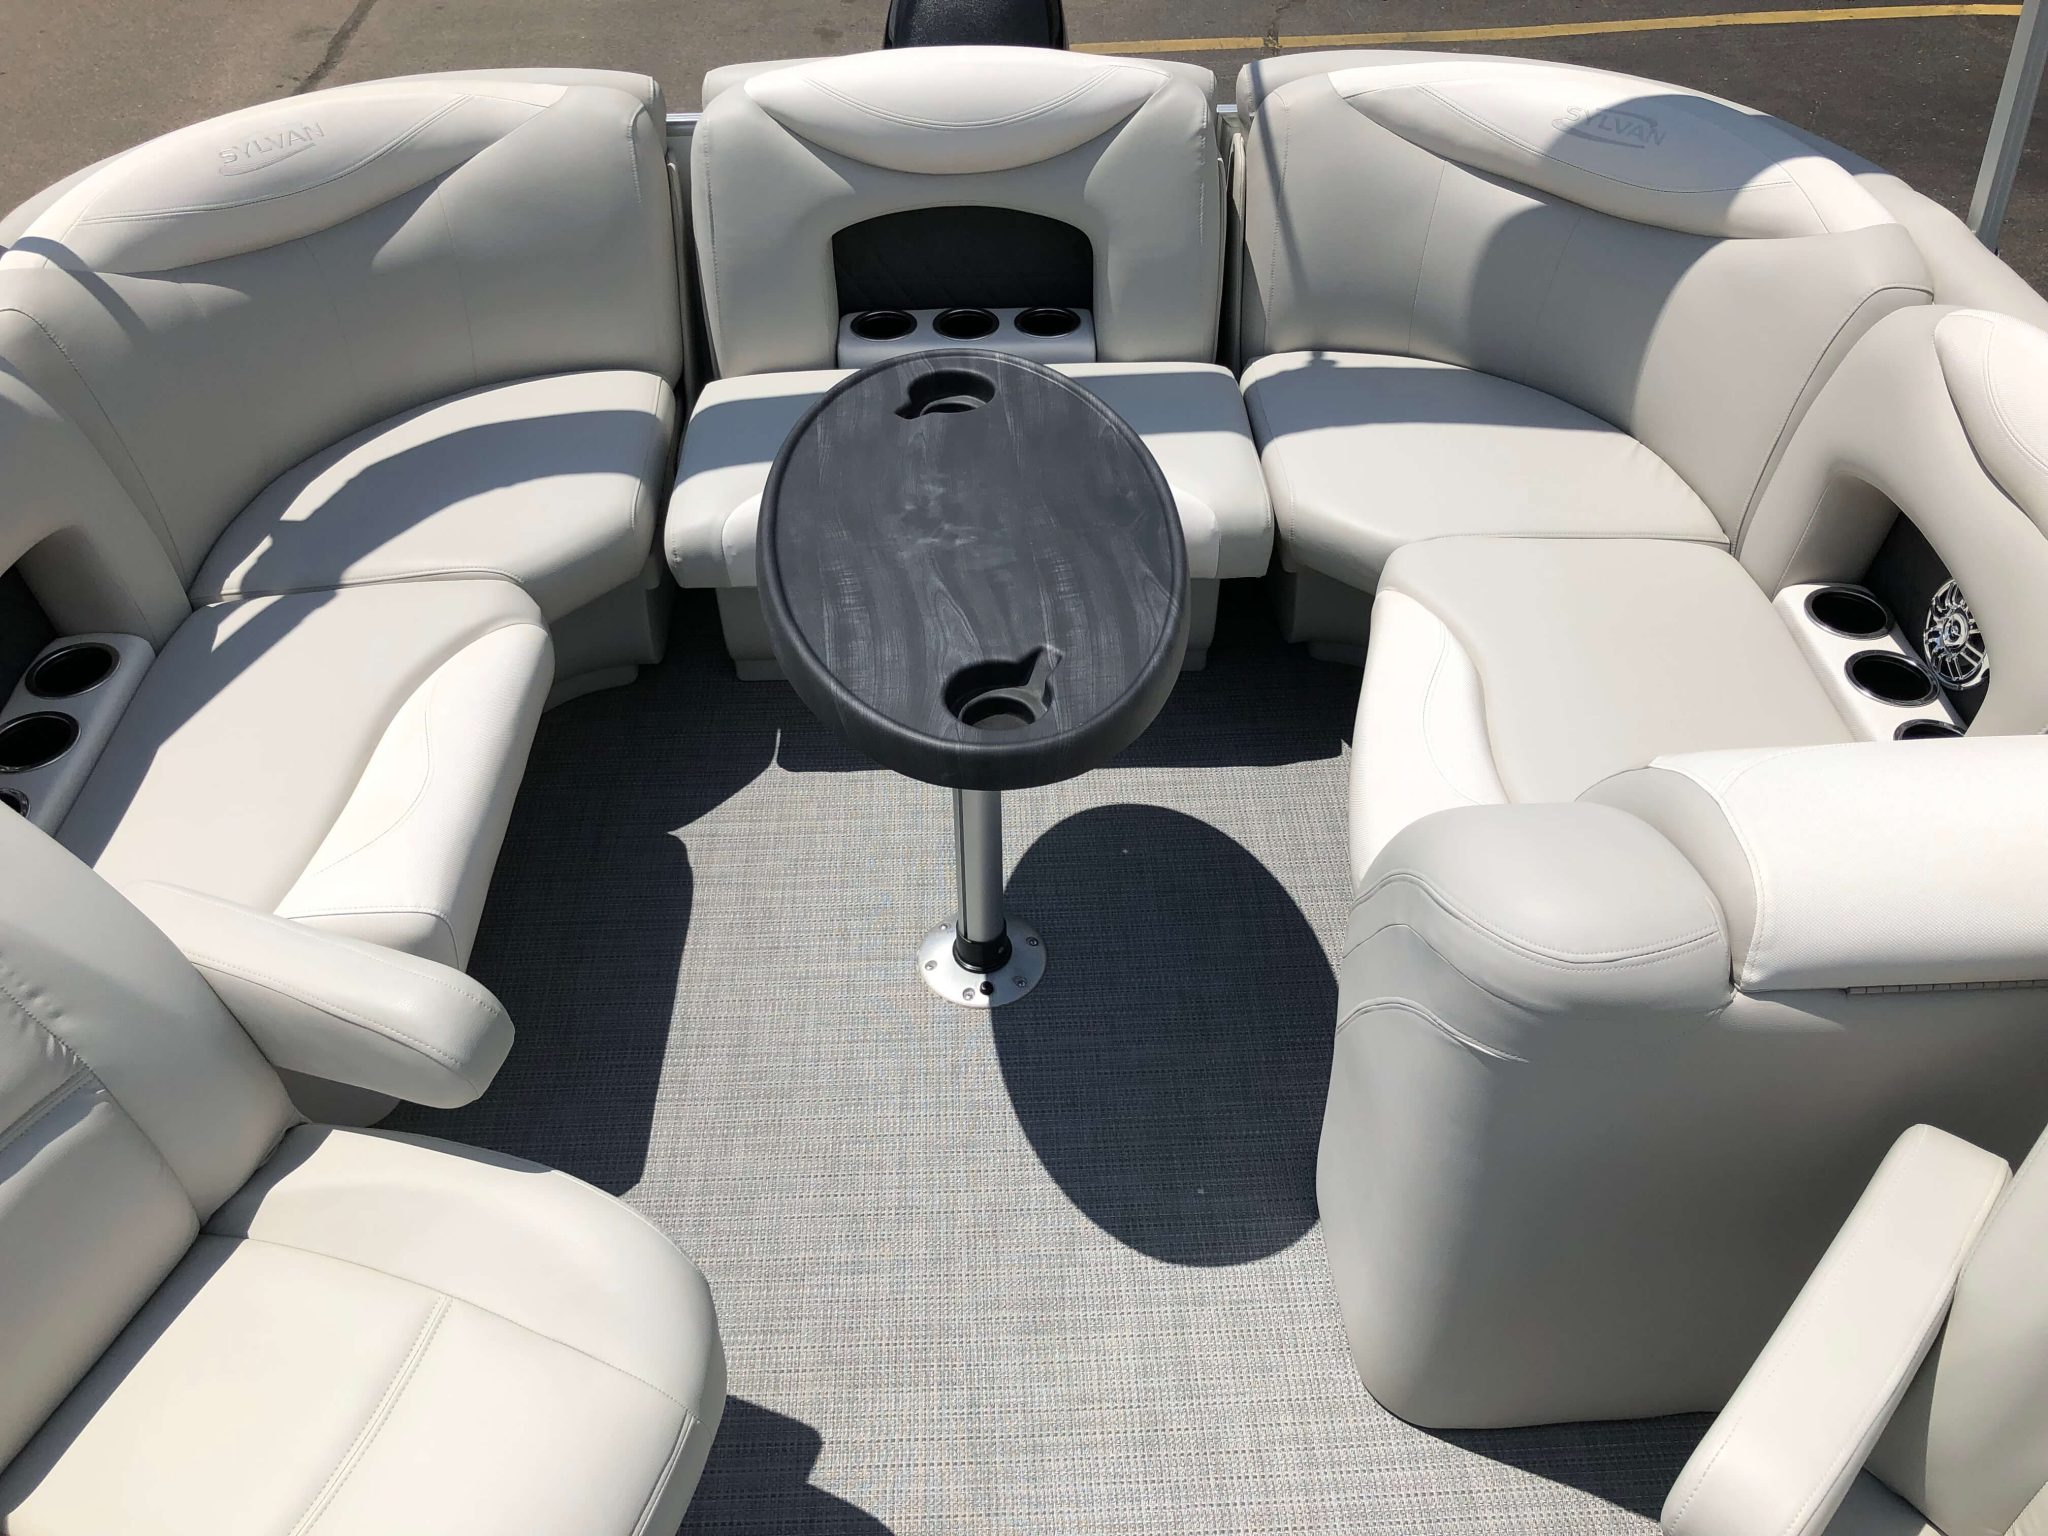 2016 Sylvan 8520 LZ LES Pontoon Boat Layout 3